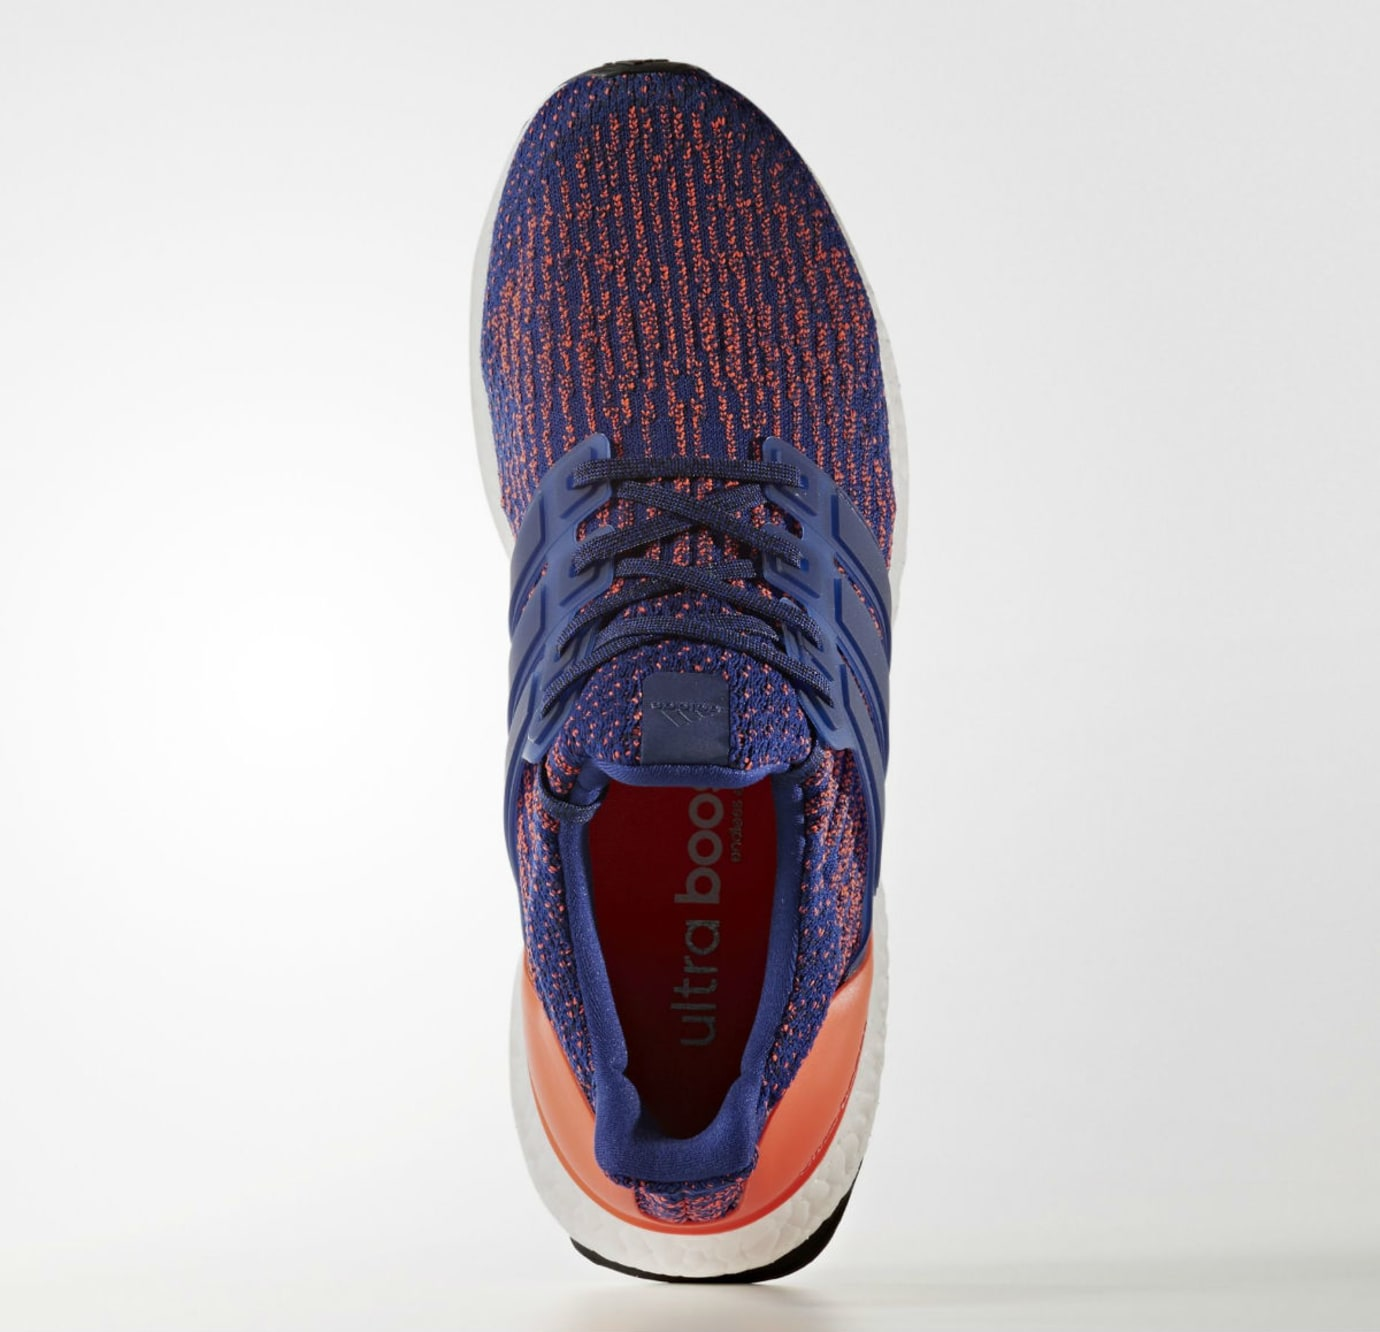 11d9912069f0 Adidas Ultra Boost 3.0 Purple Orange Release Date Top S82020